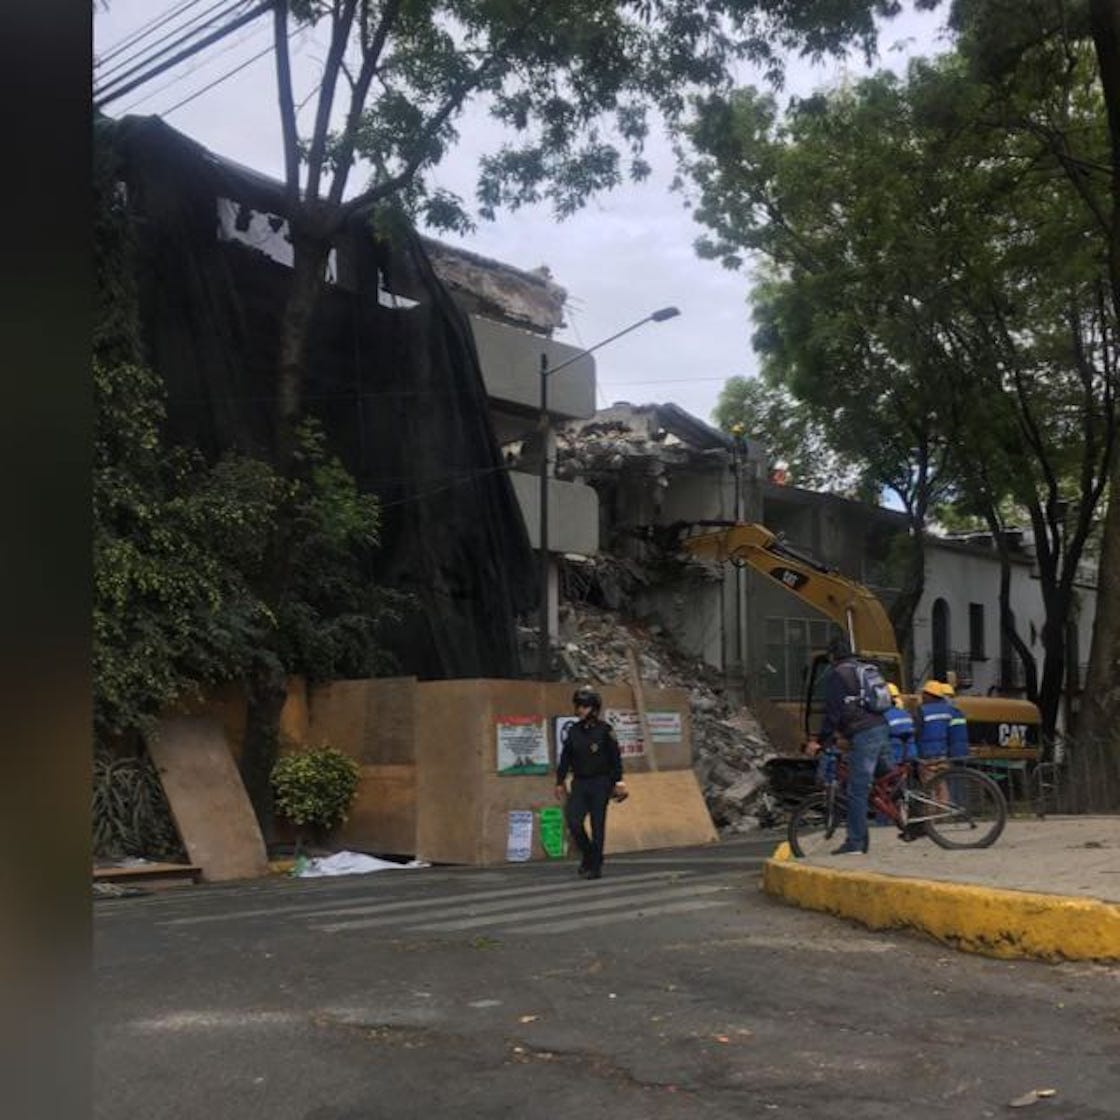 alfonso-reyes-188-cartel-inmobiliario-damnificados-unidos-19-septiembre-sismo-03